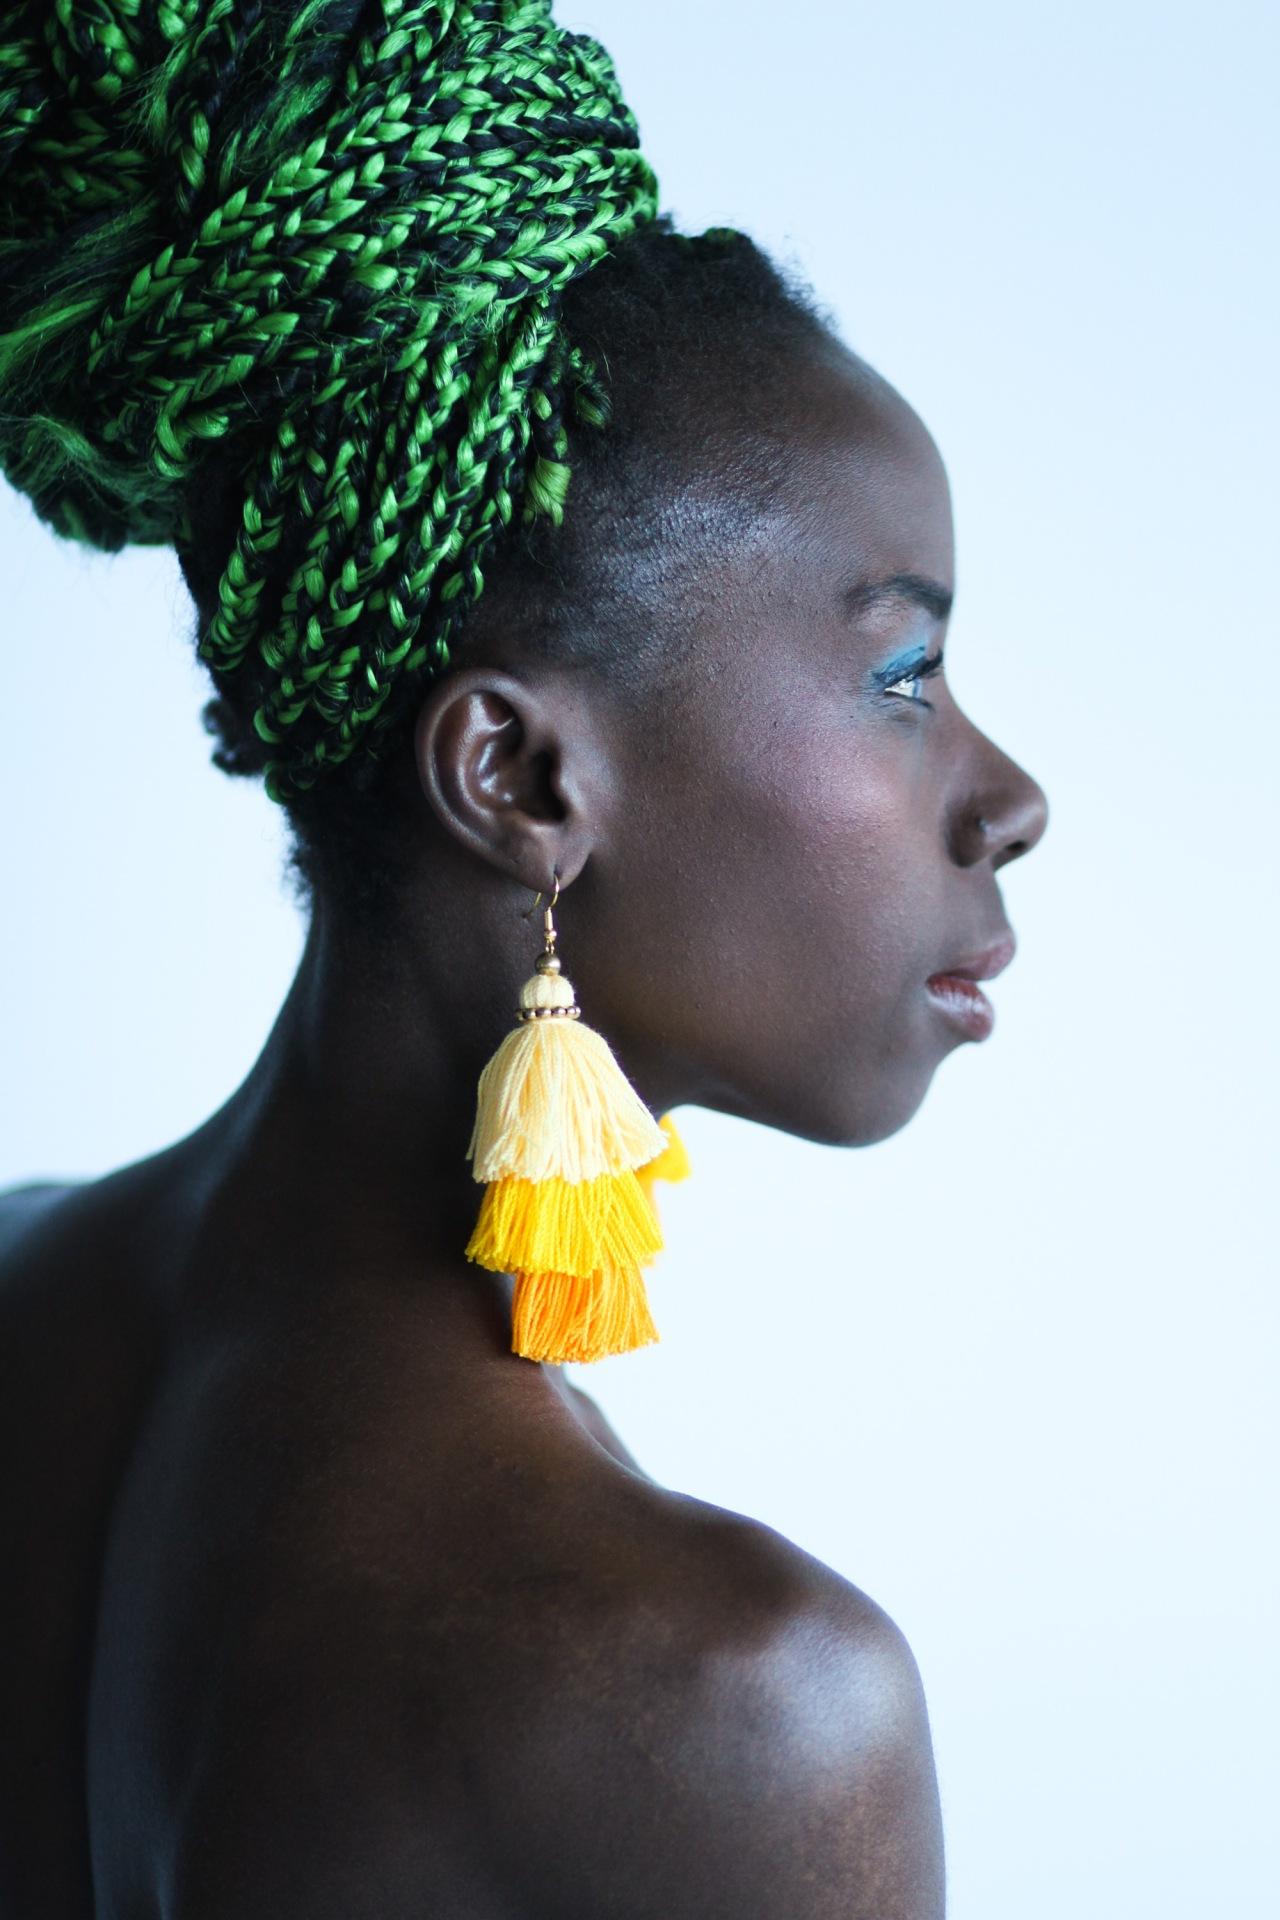 myrainbowtee earrings photo marie my-51